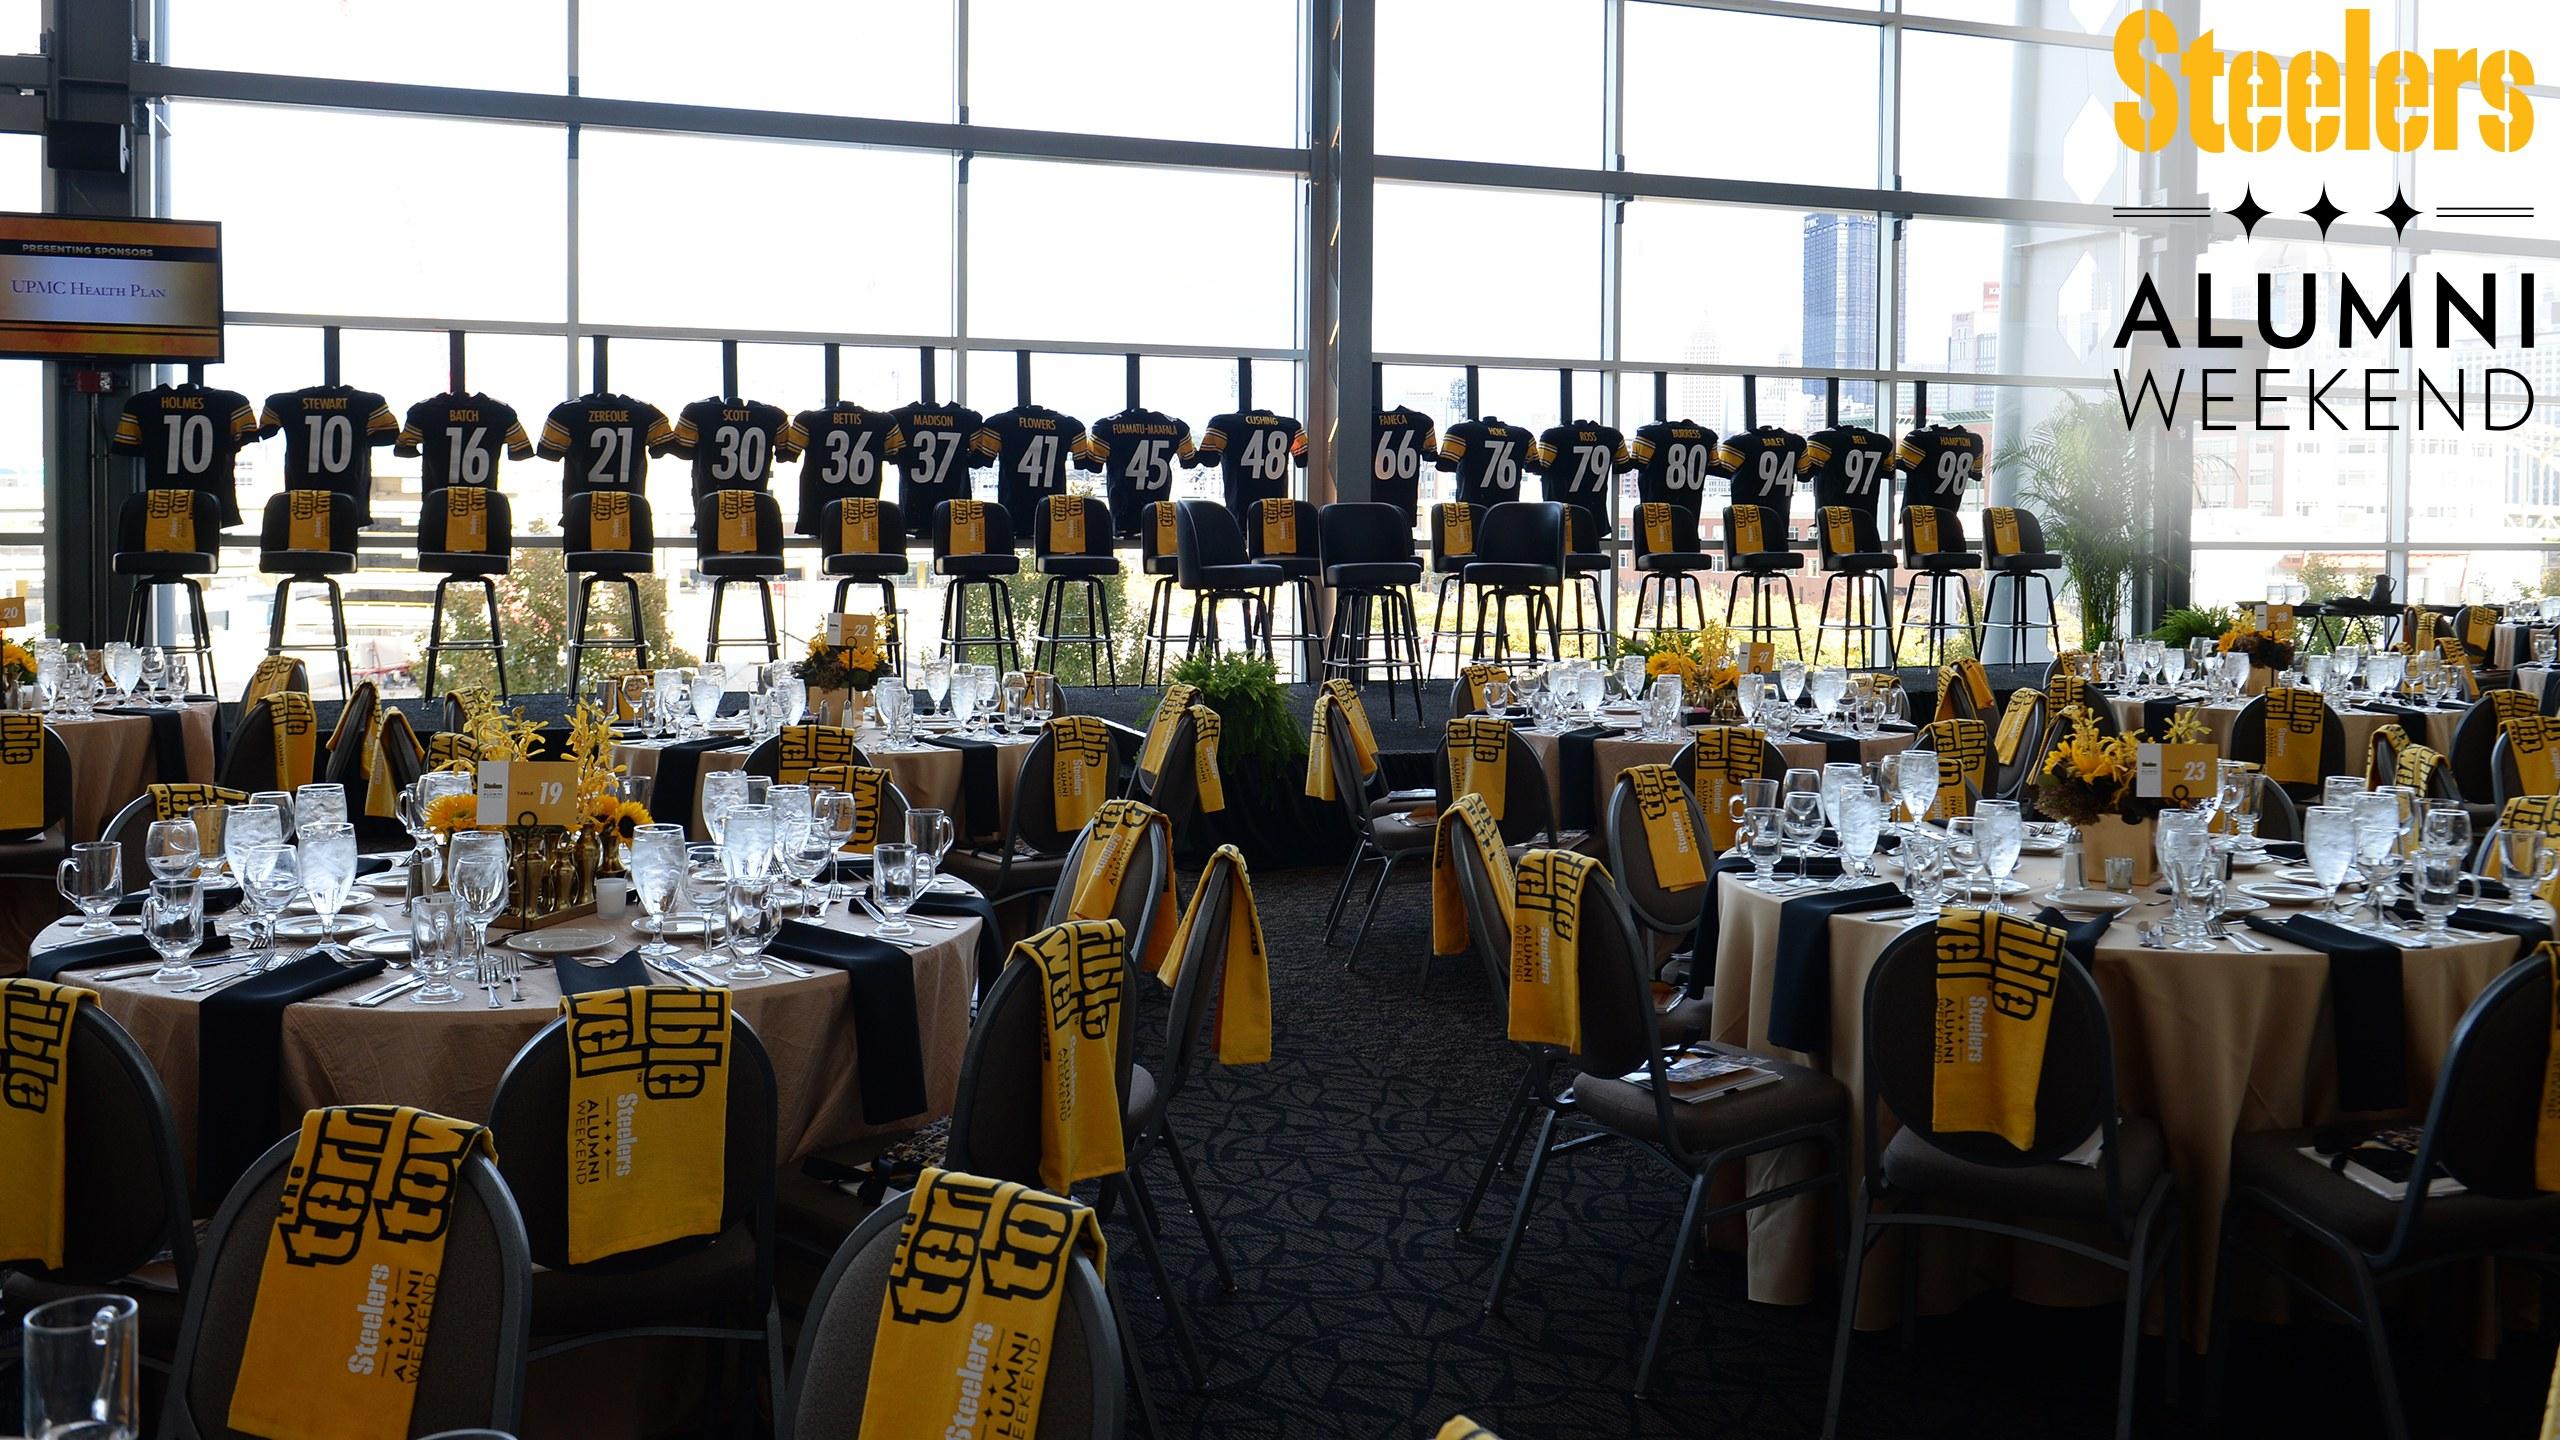 Steelers alumni weekend dinner pittsburgh steelers steelers purchase tickets m4hsunfo